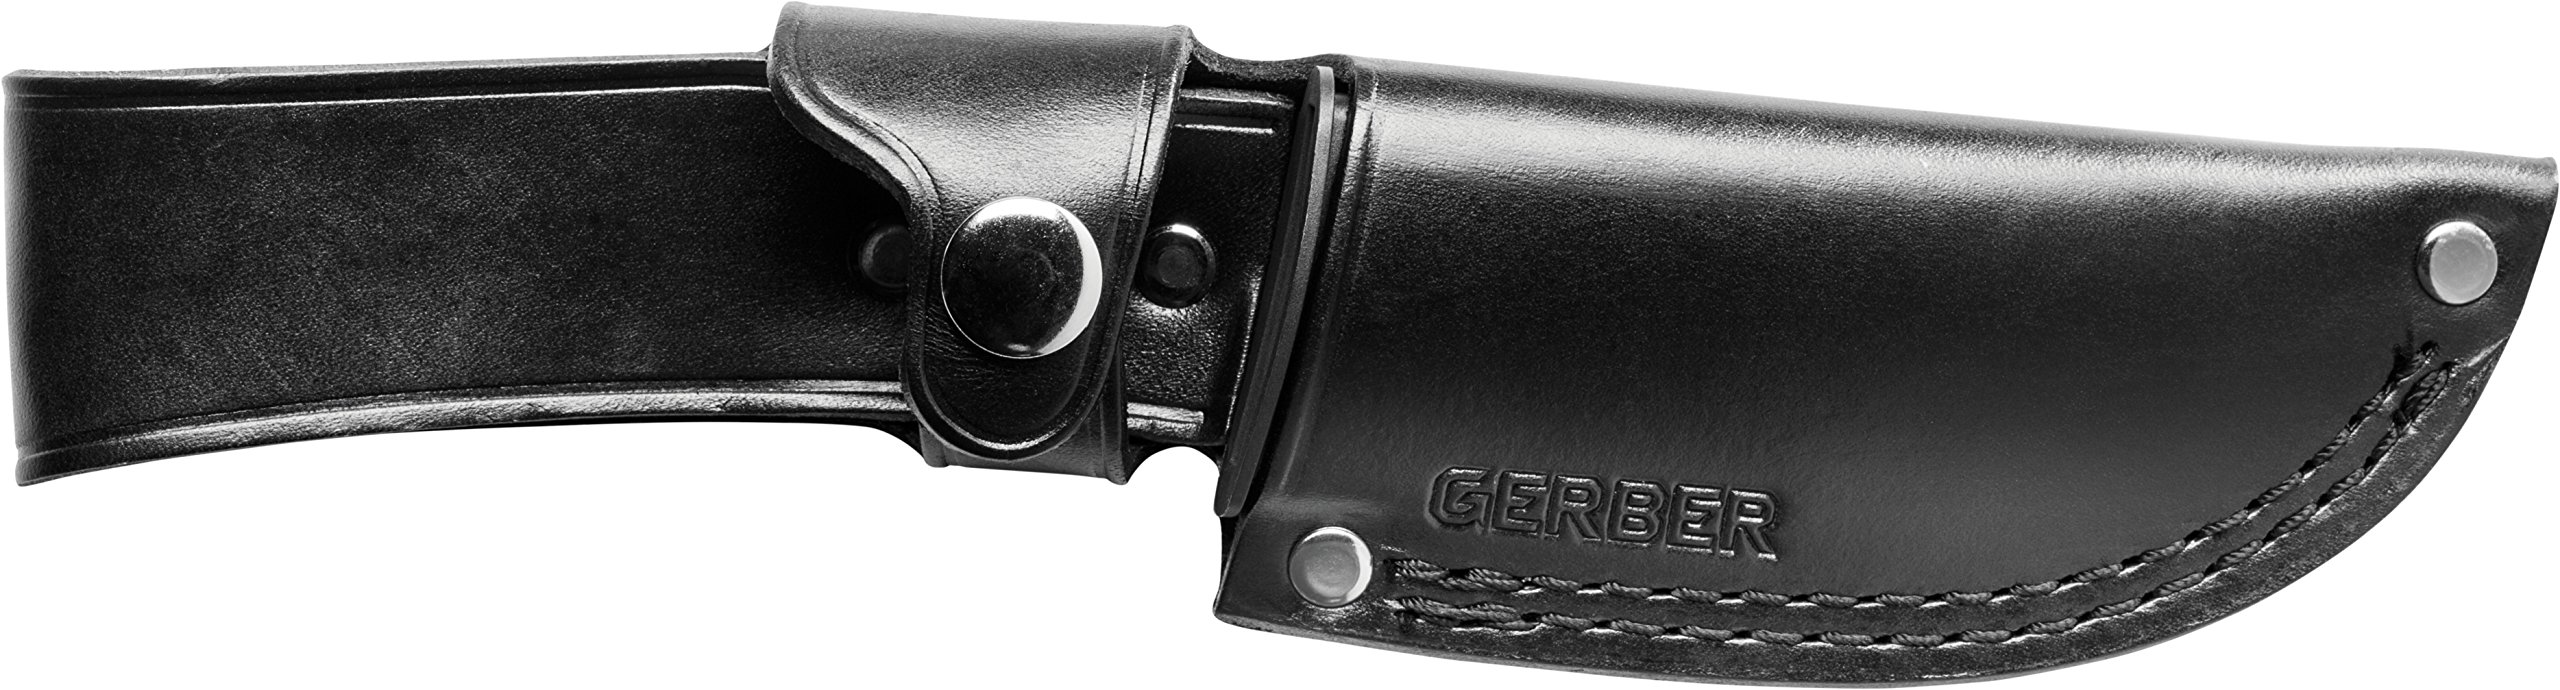 Gerber Gator Premium Fixed Blade Knife by Gerber